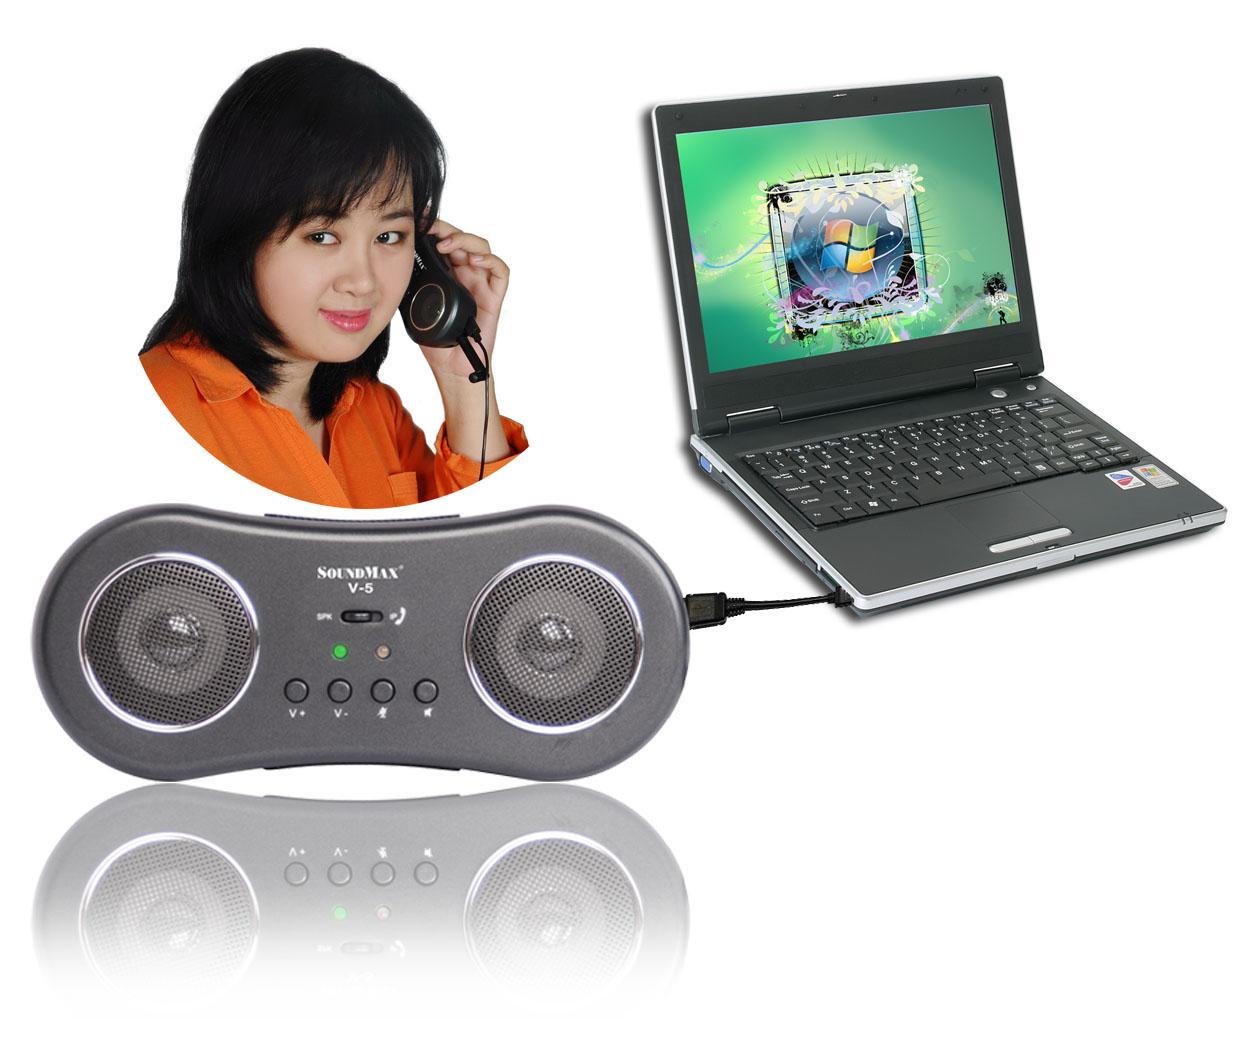 Loa SoundMax V-5/2.0